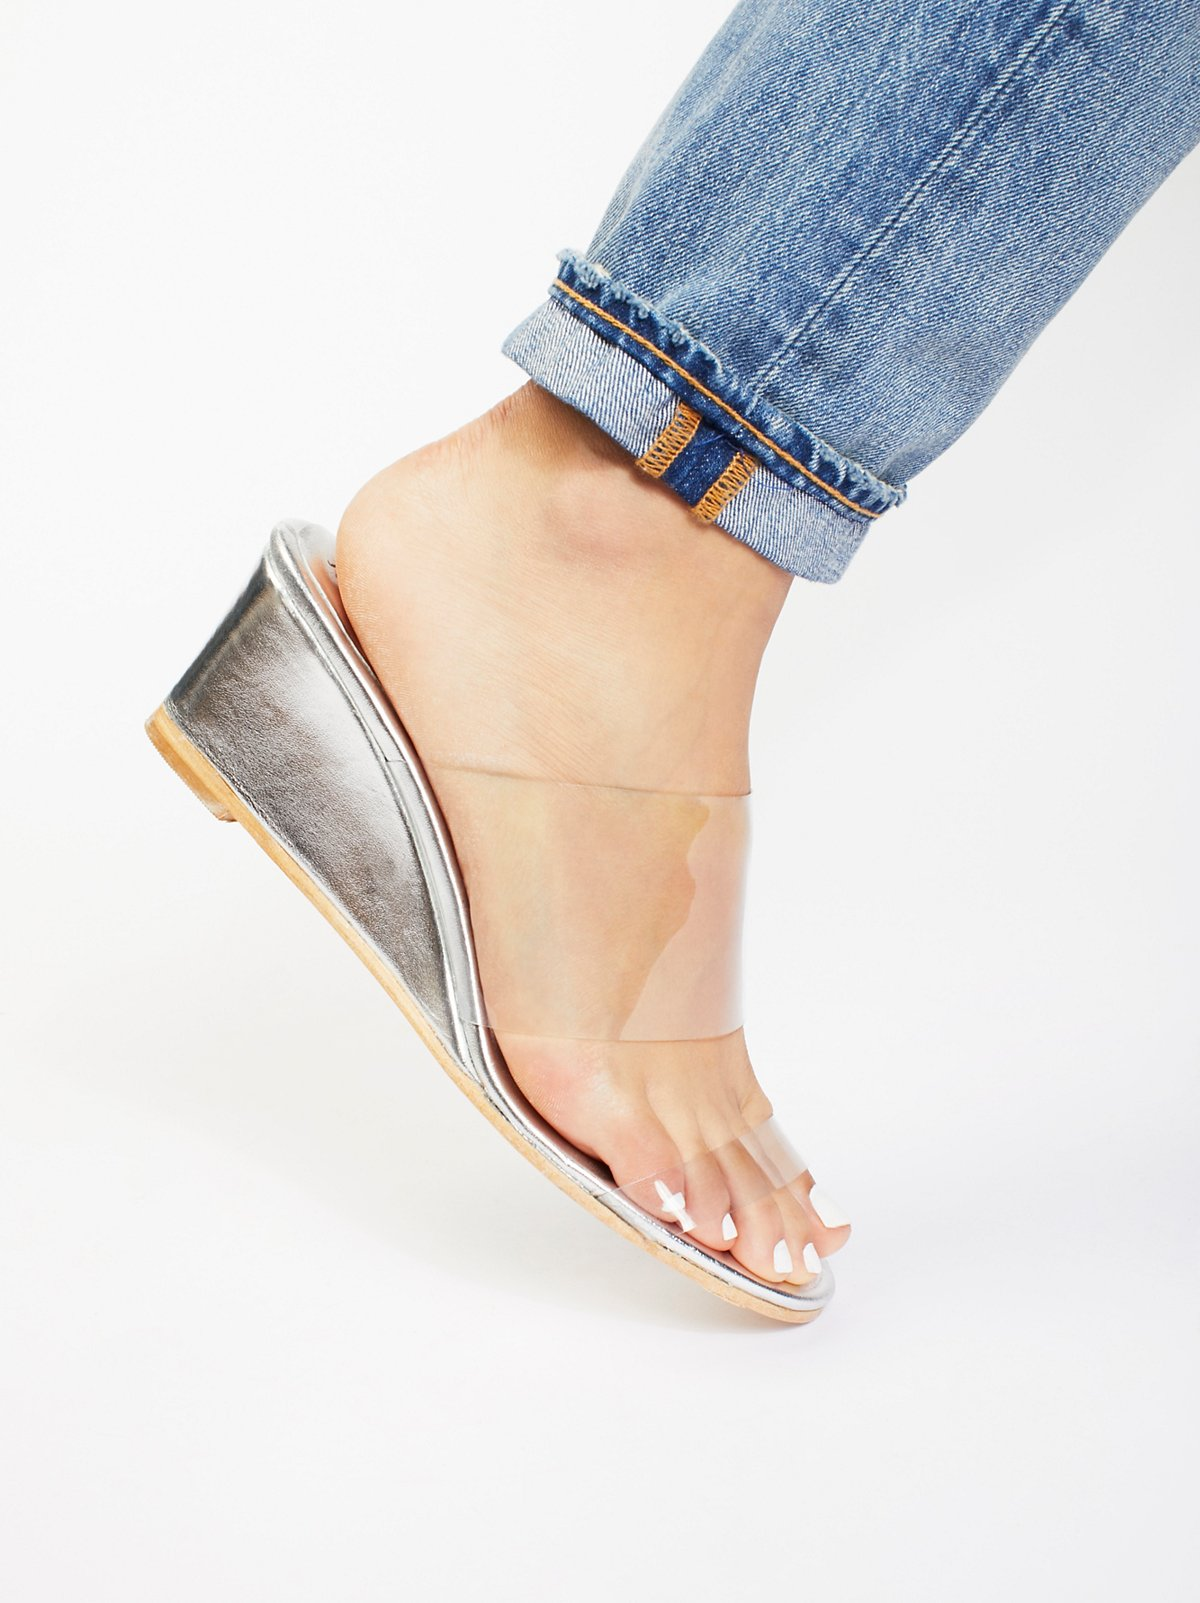 Dewan坡跟凉鞋